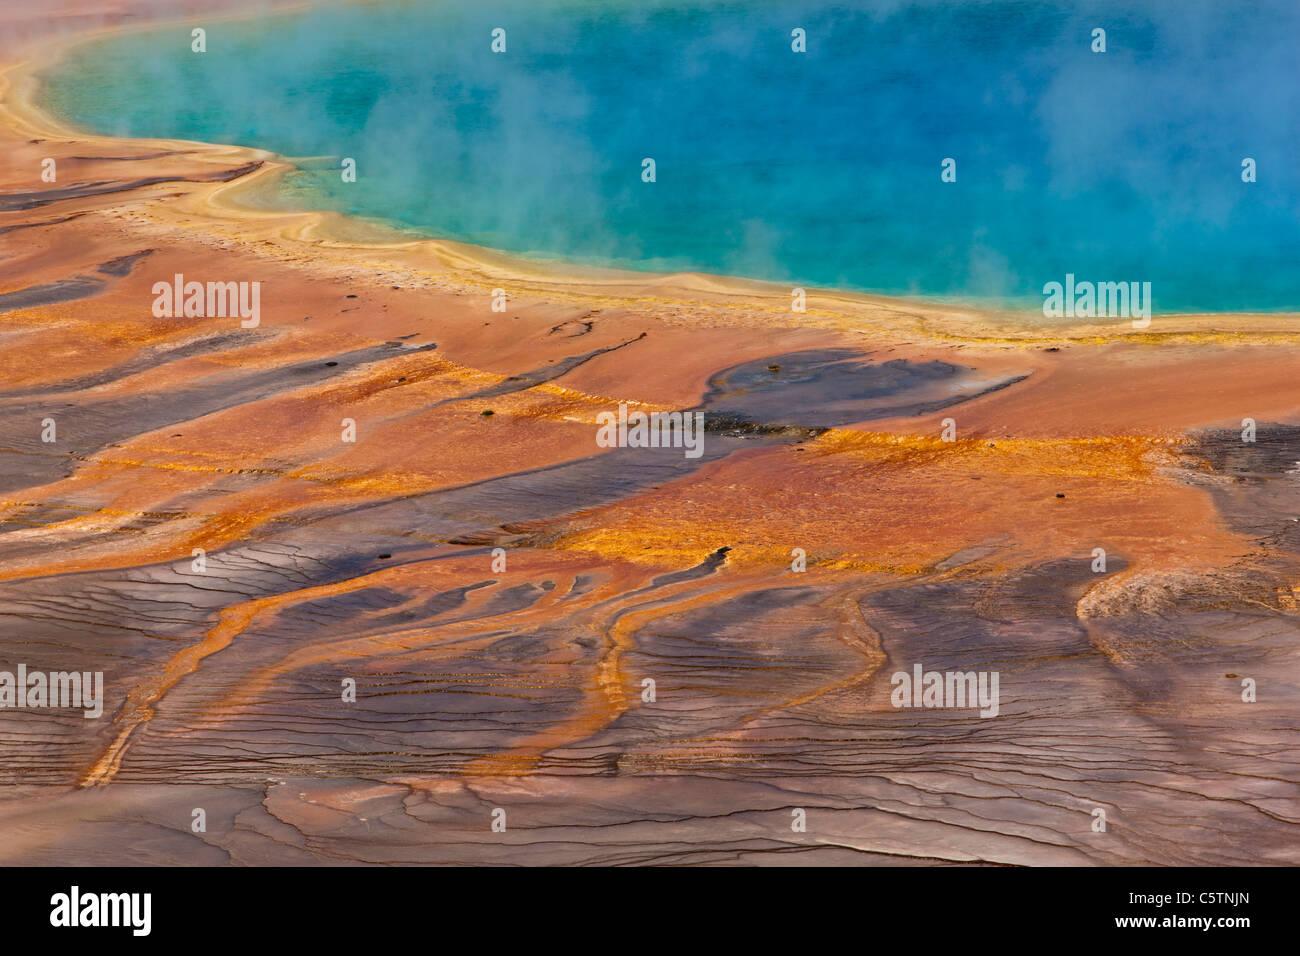 USA, Wyoming, Yellowstone National Park, Grand Prismatic Spring - Stock Image